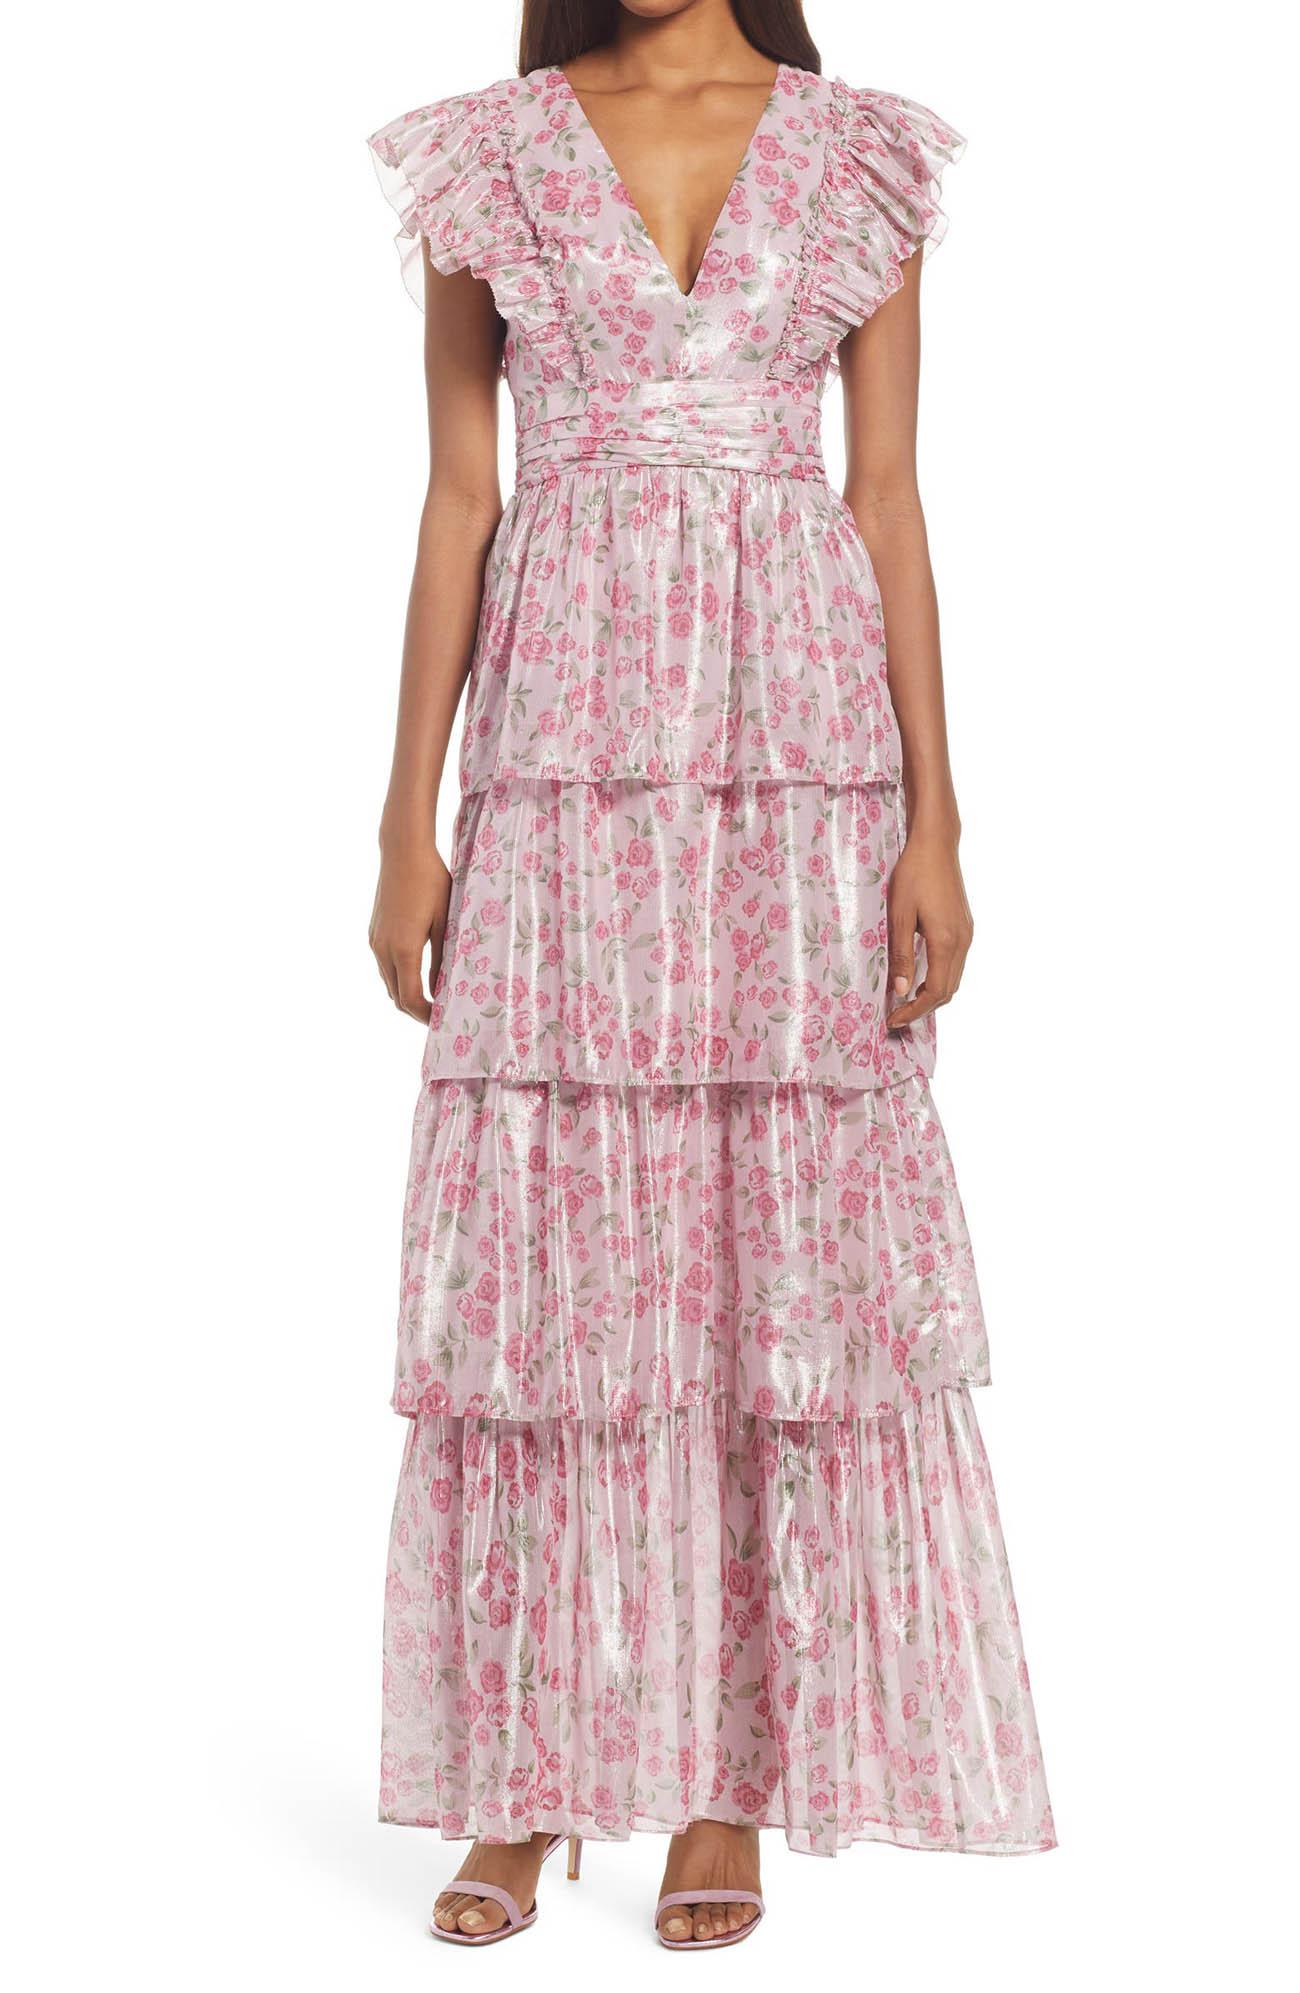 pink floral spring guest wedding dress